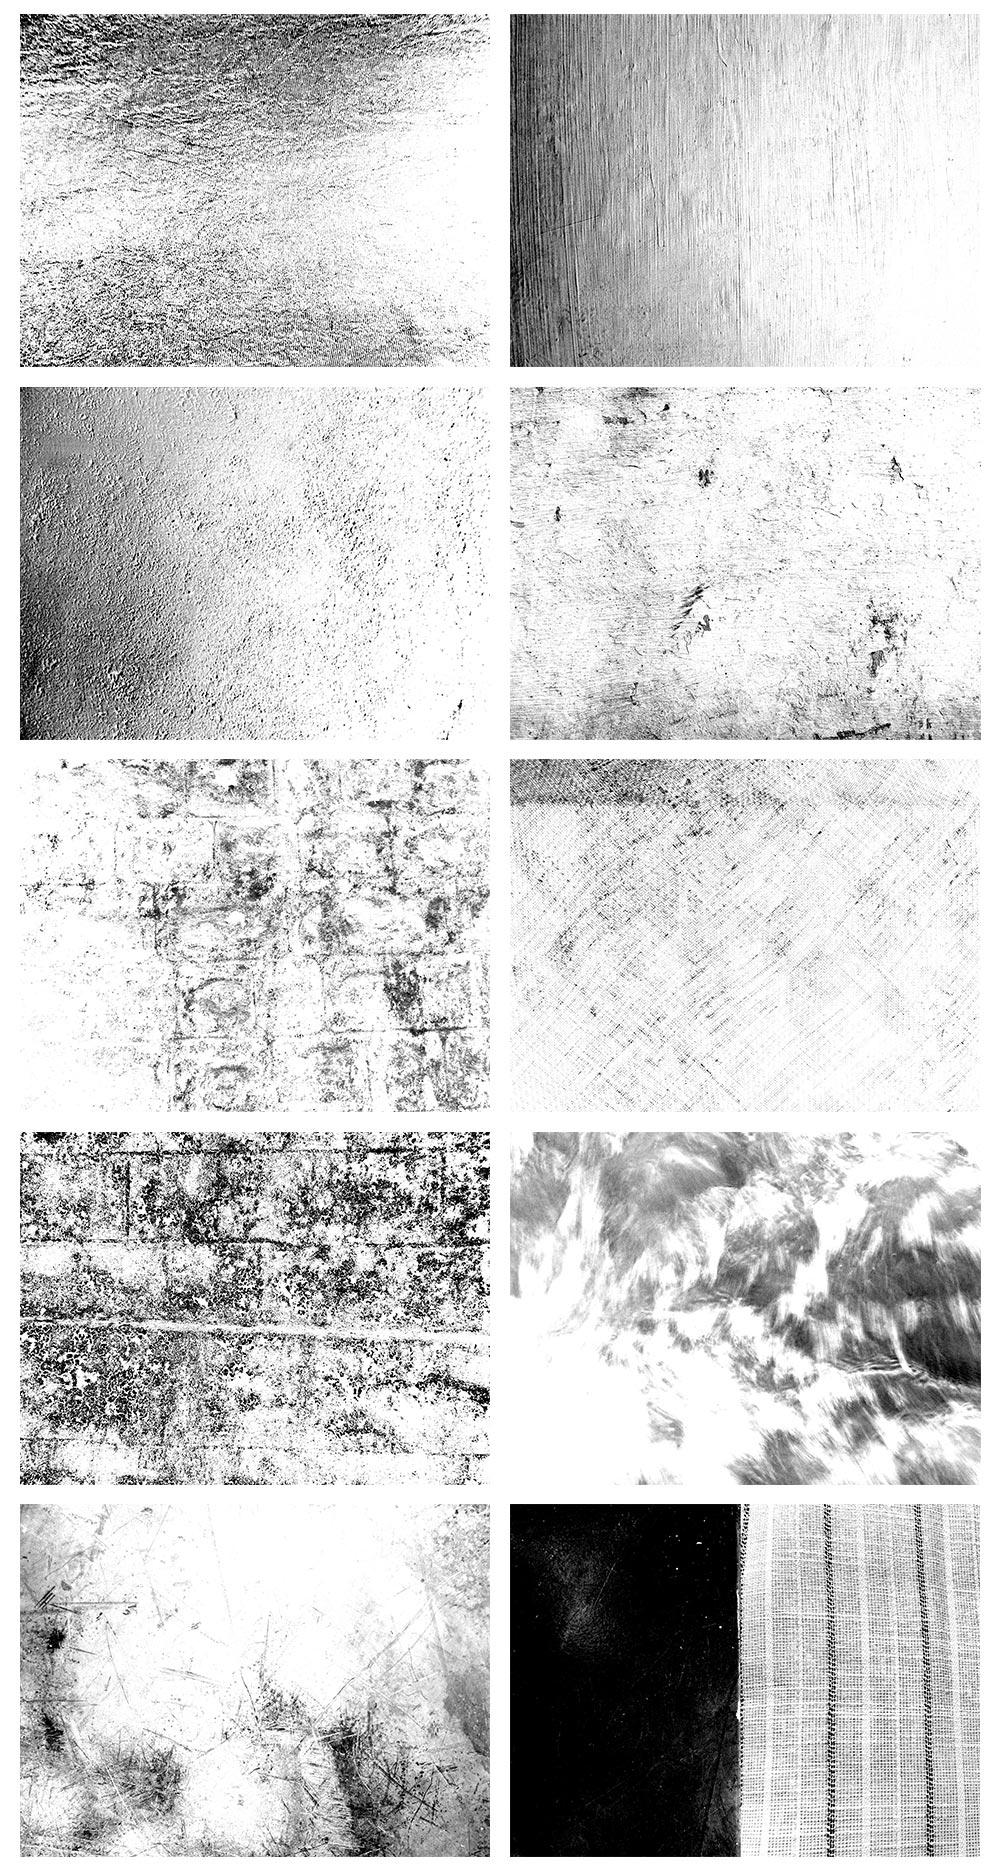 http://www.graphicsfuel.com/wp-content/uploads/2014/11/10-grunge-textures.jpg